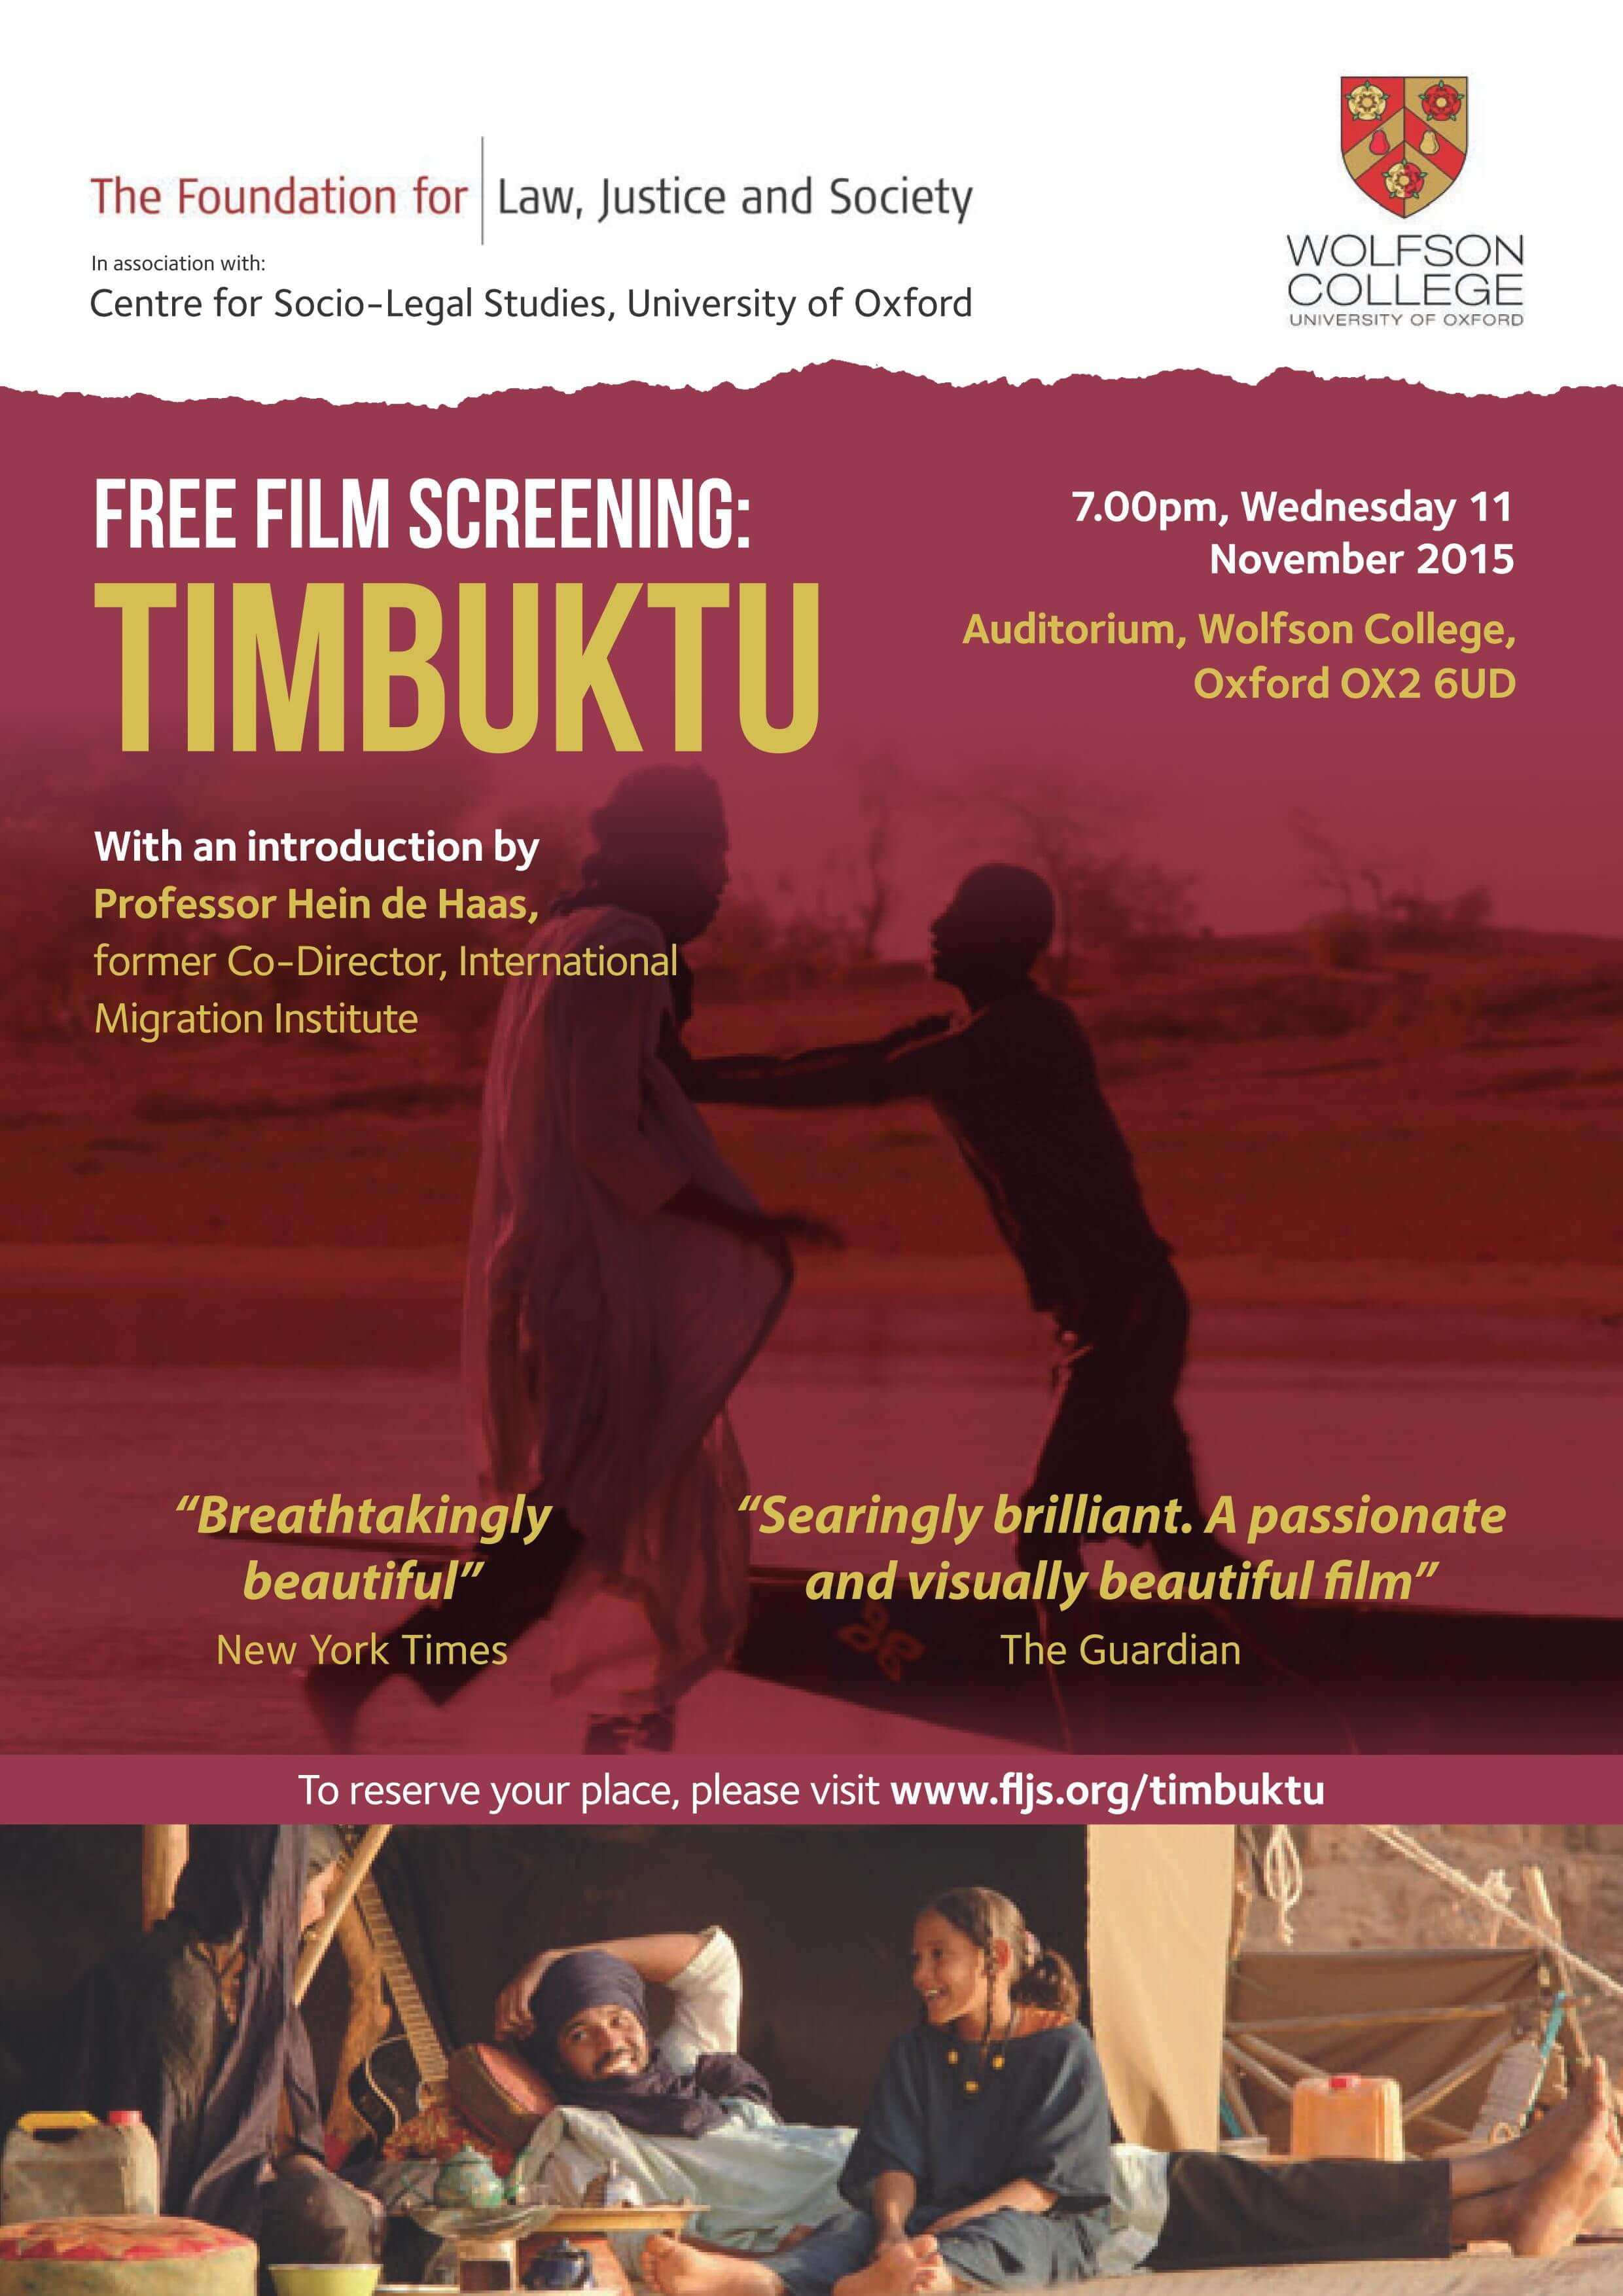 Free Film Screening of Timbuktu in Oxford